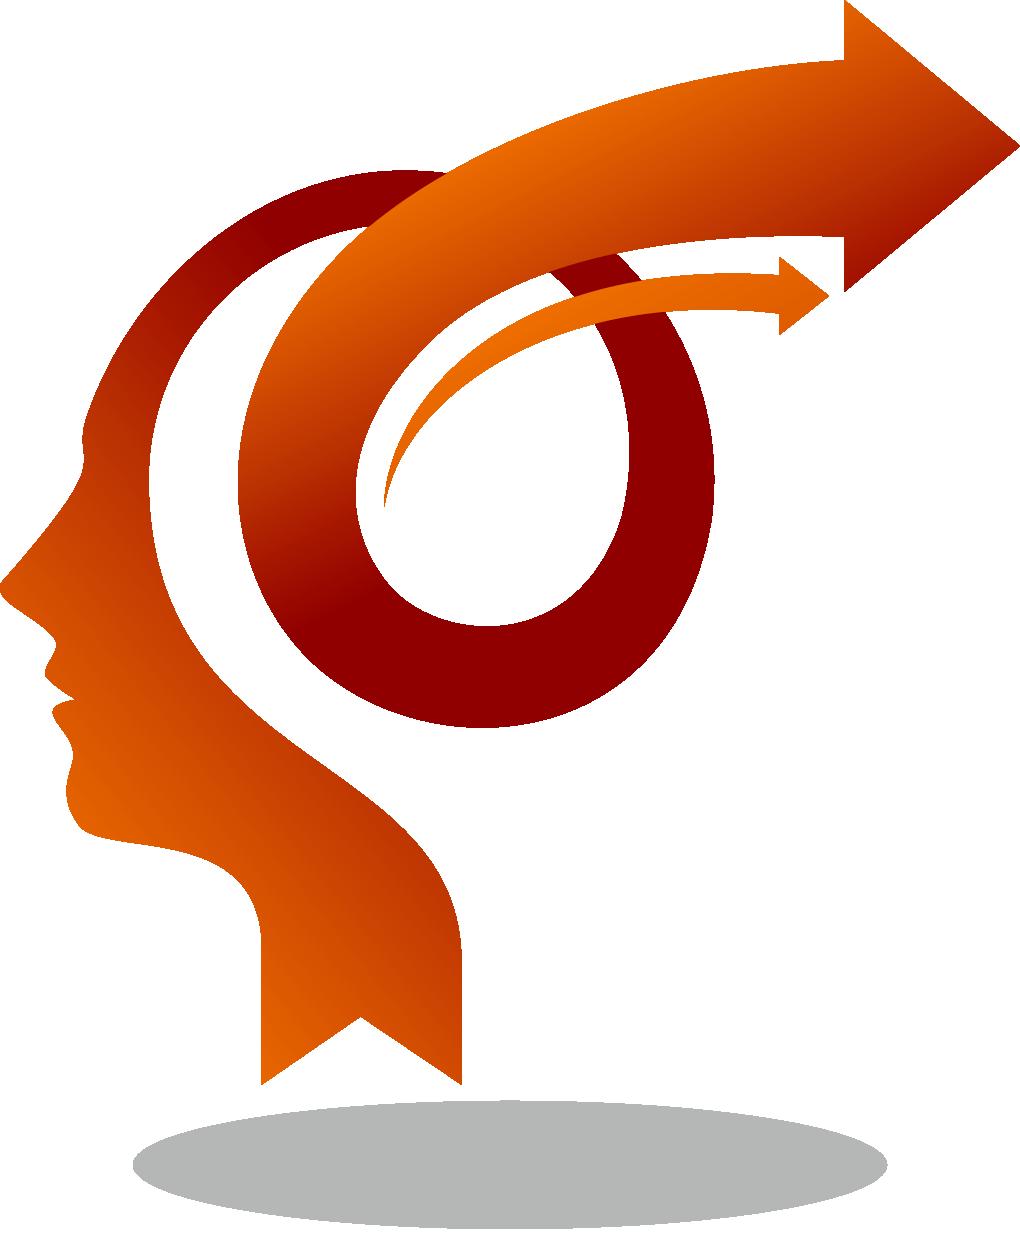 University of virginia learning. Organization clipart organization skill